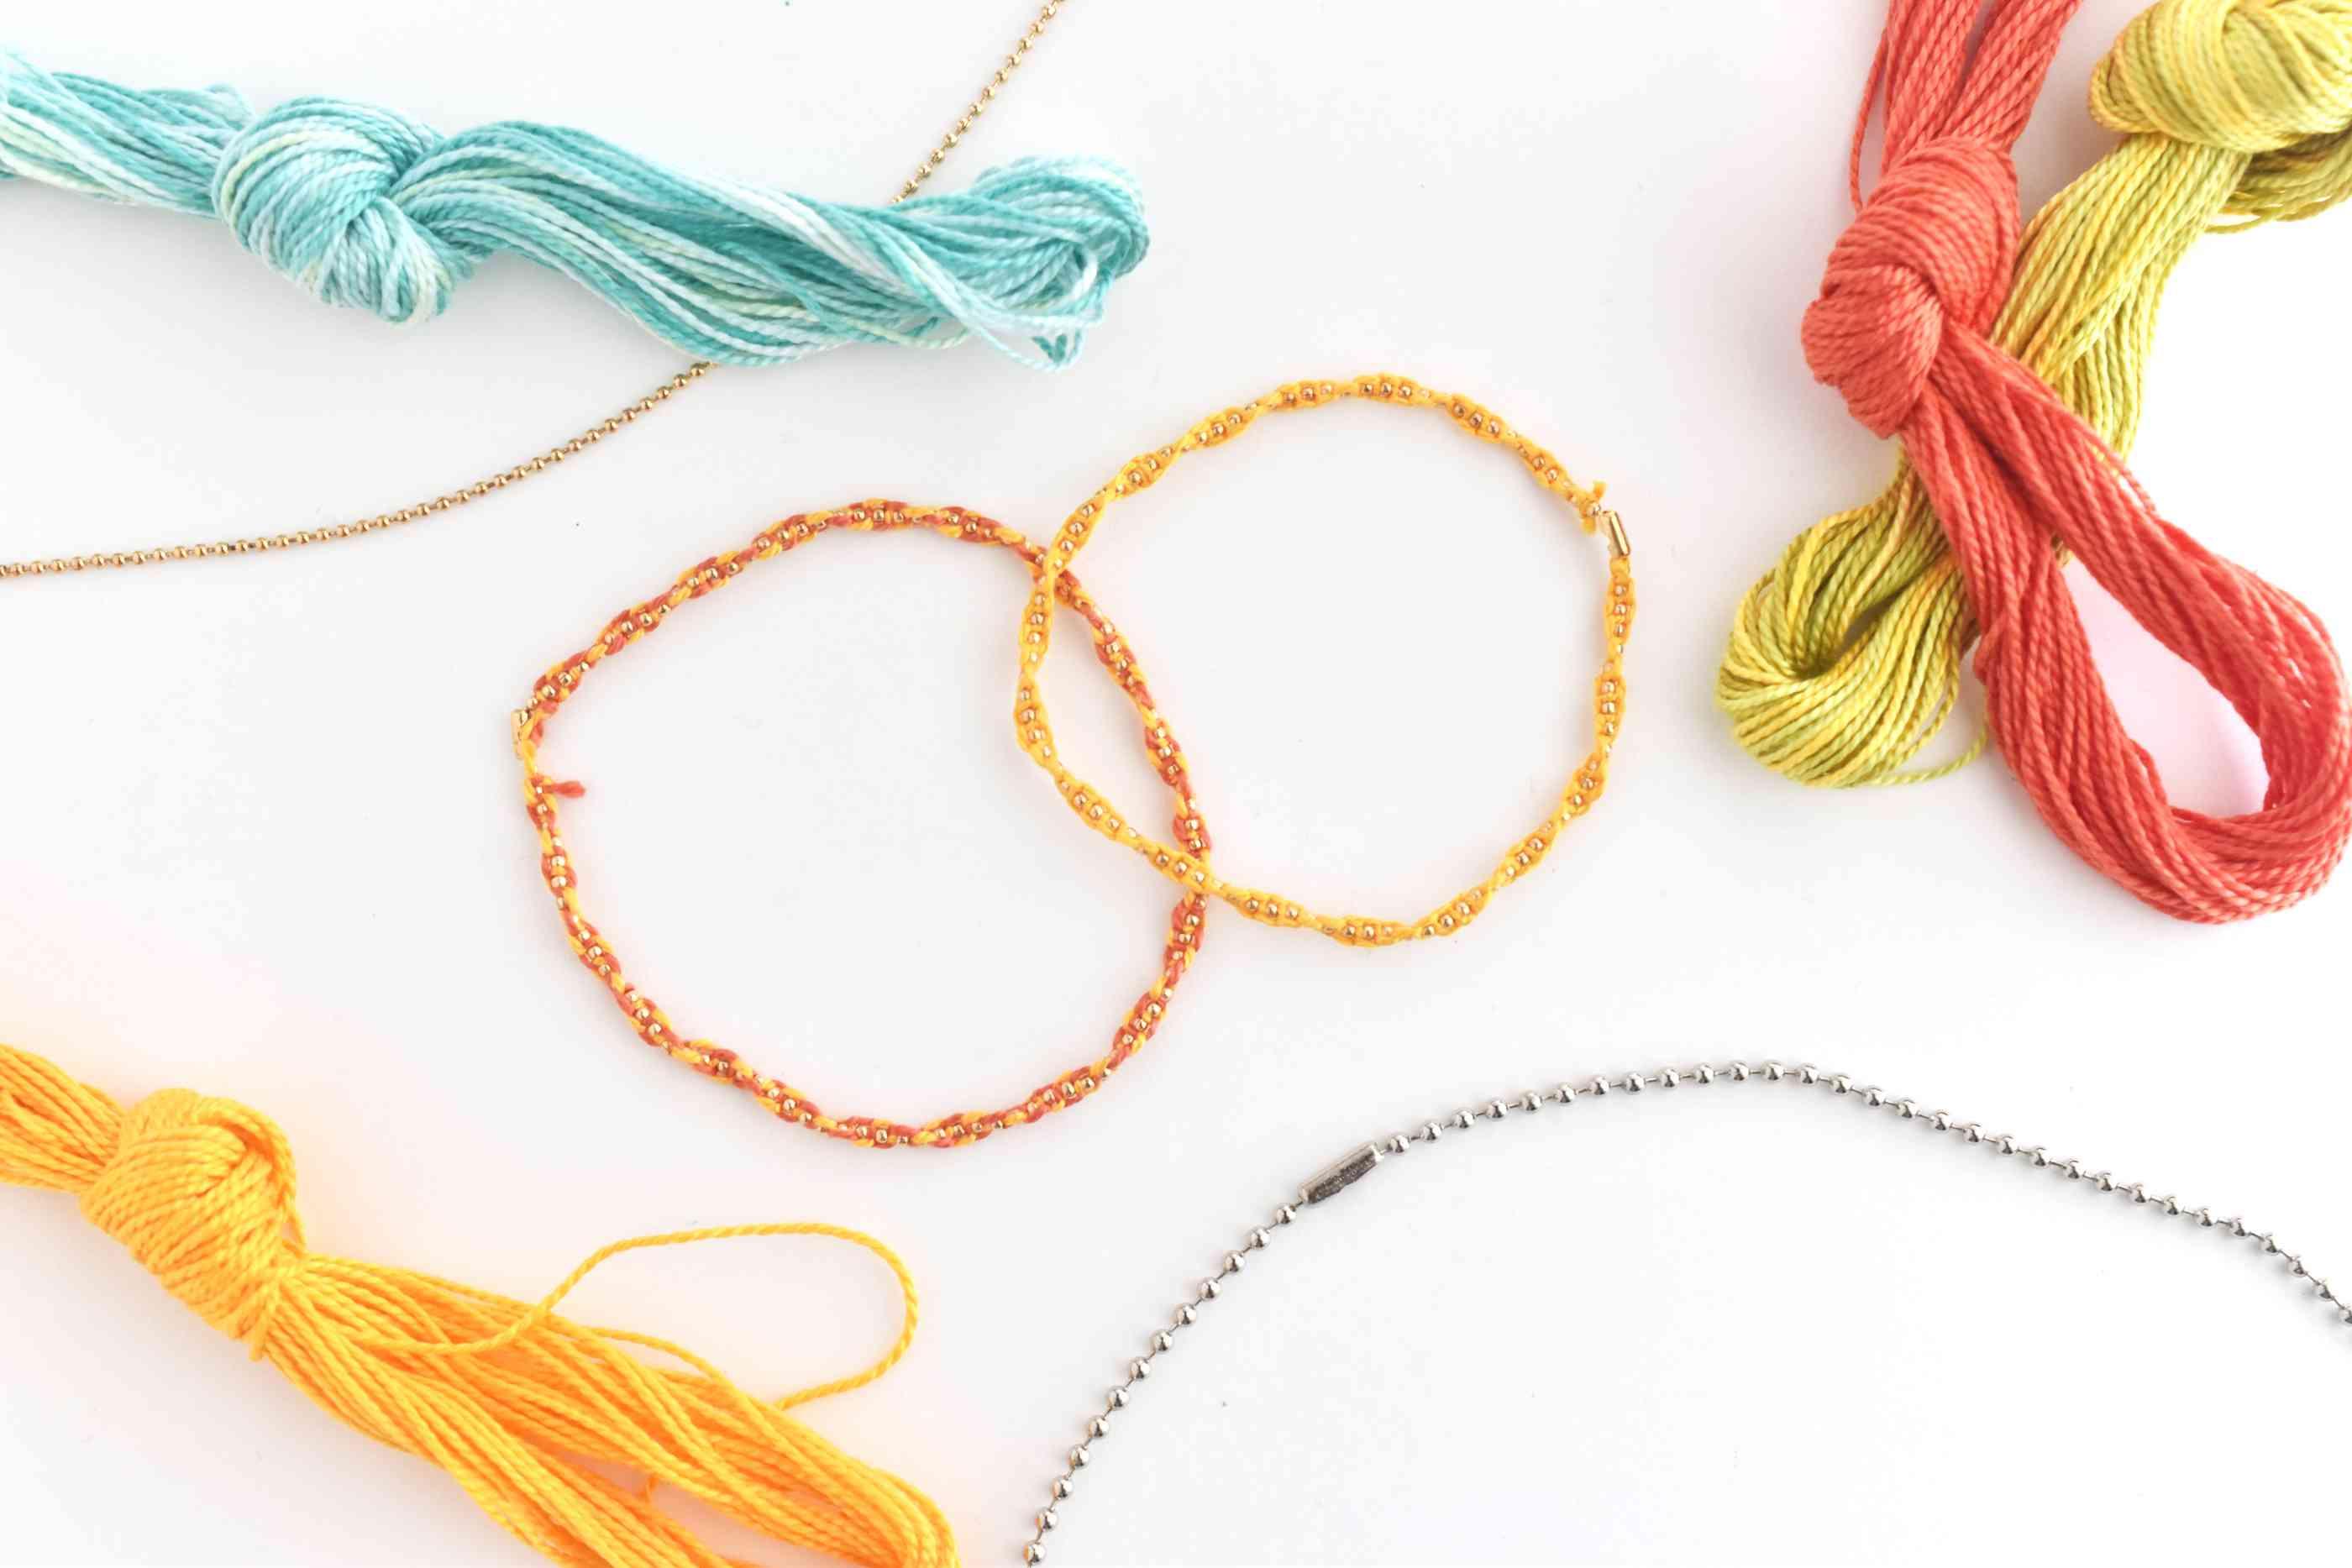 DIY Twisted Knots on a Ball Chain Bracelet